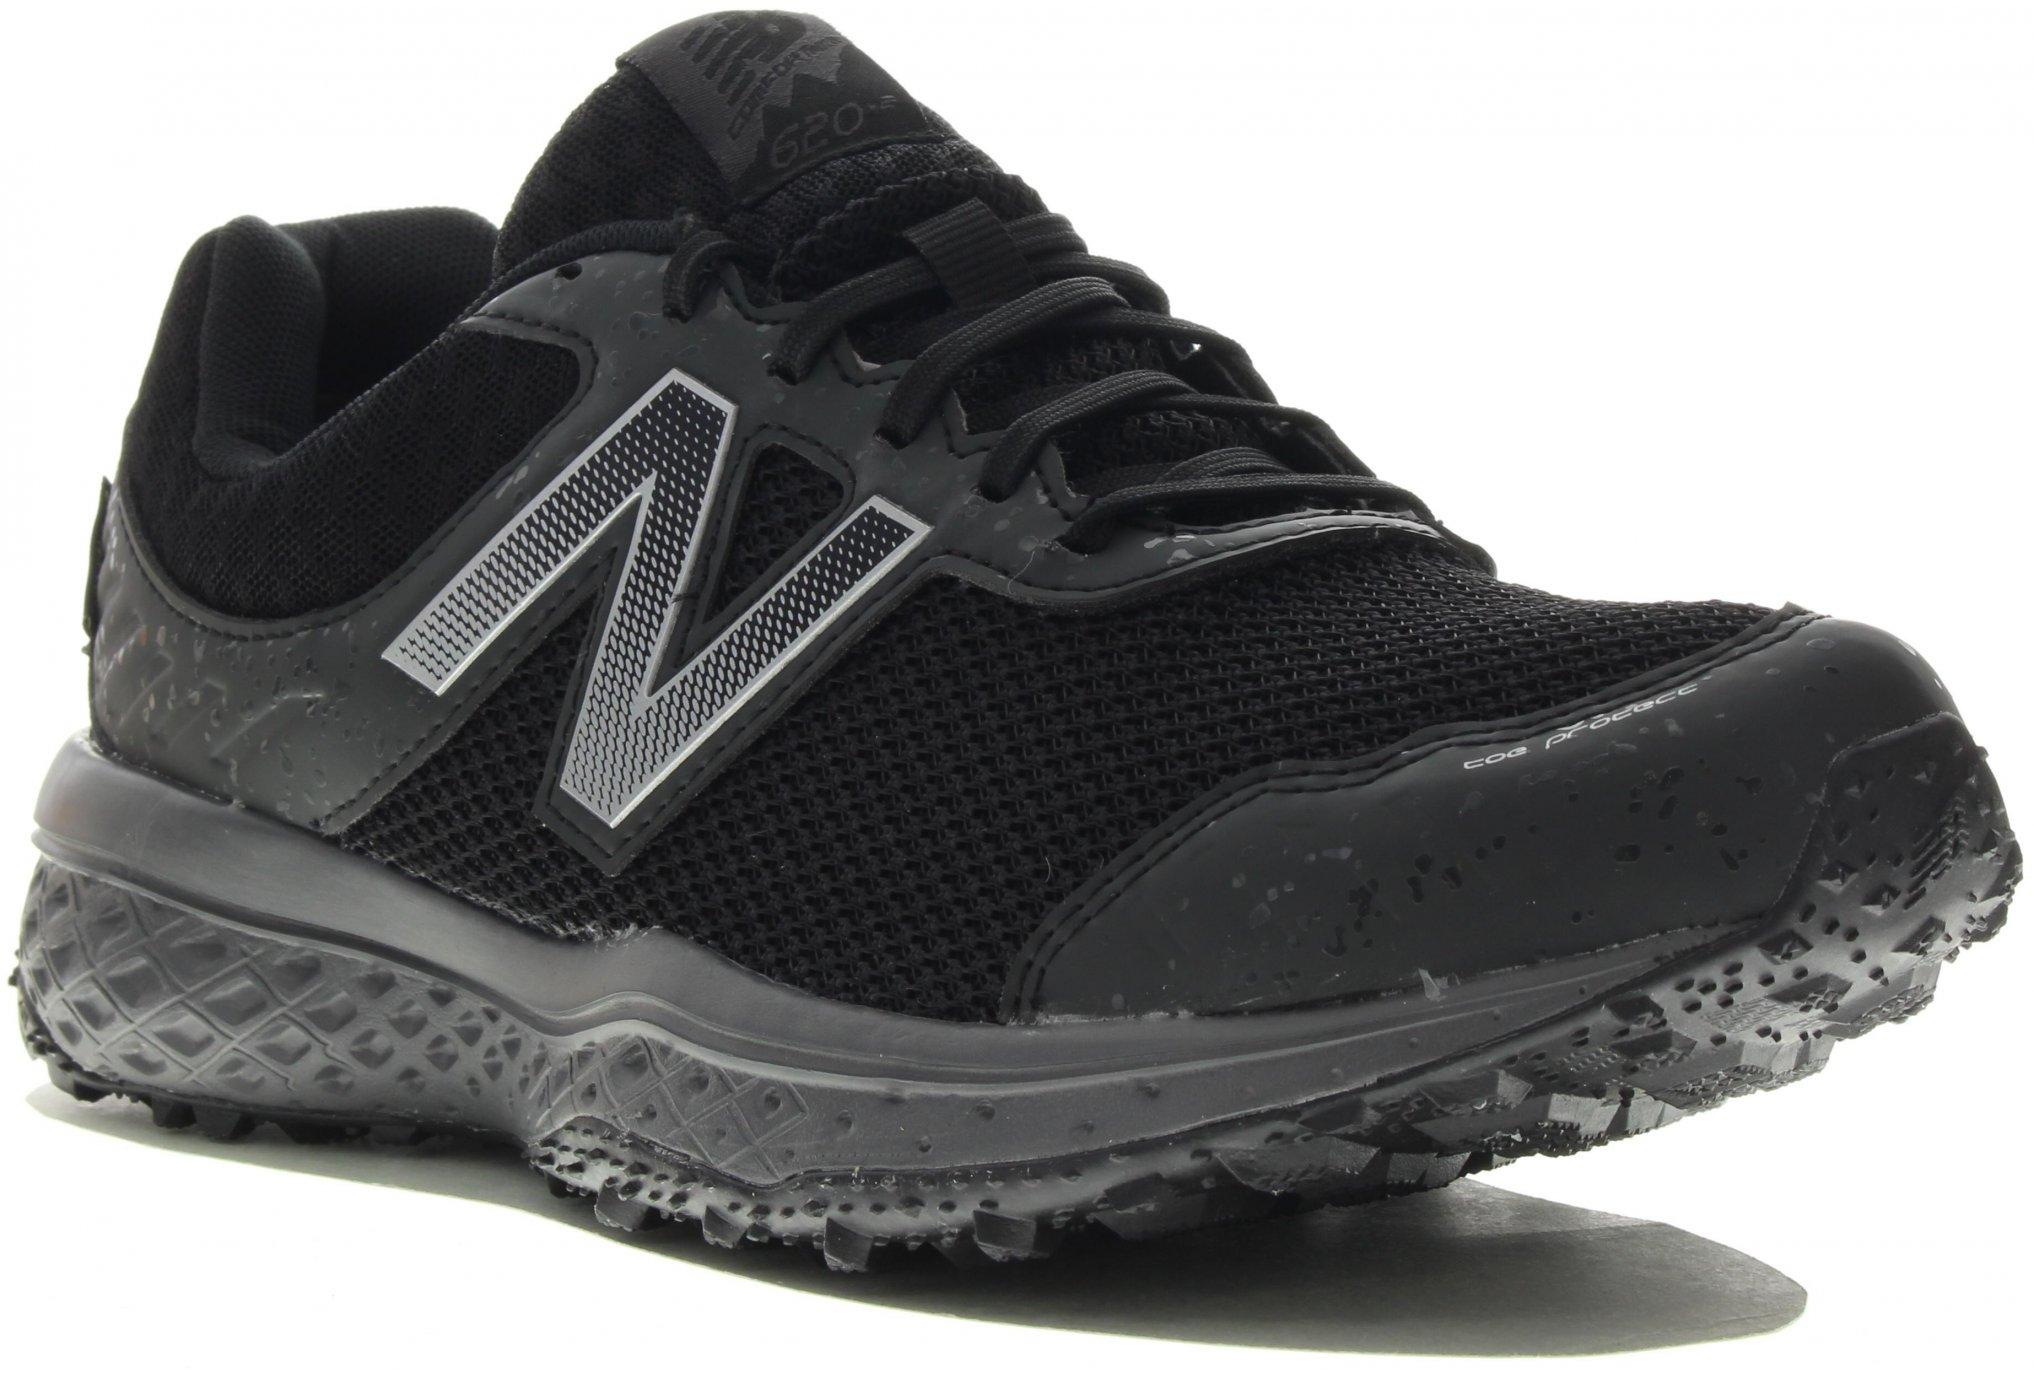 V3 Du Chaussures Balance Wt Femme New Trail B 910 Running Magnoac 6SdqwqYg